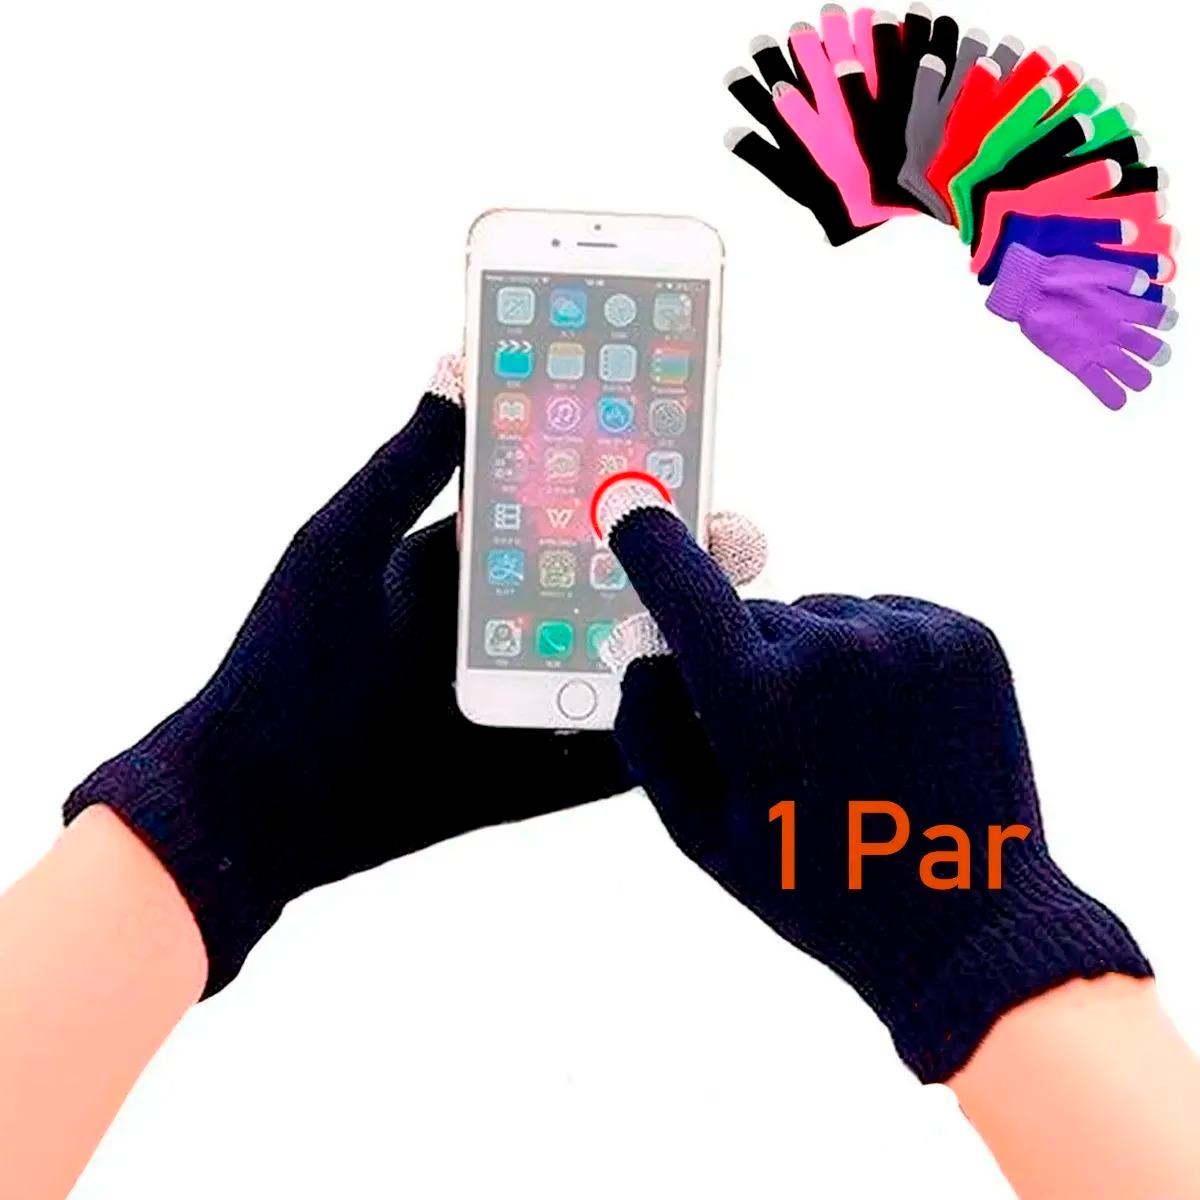 Guantes De Lana Tejido Touch Tablet Celular Invierno Colores